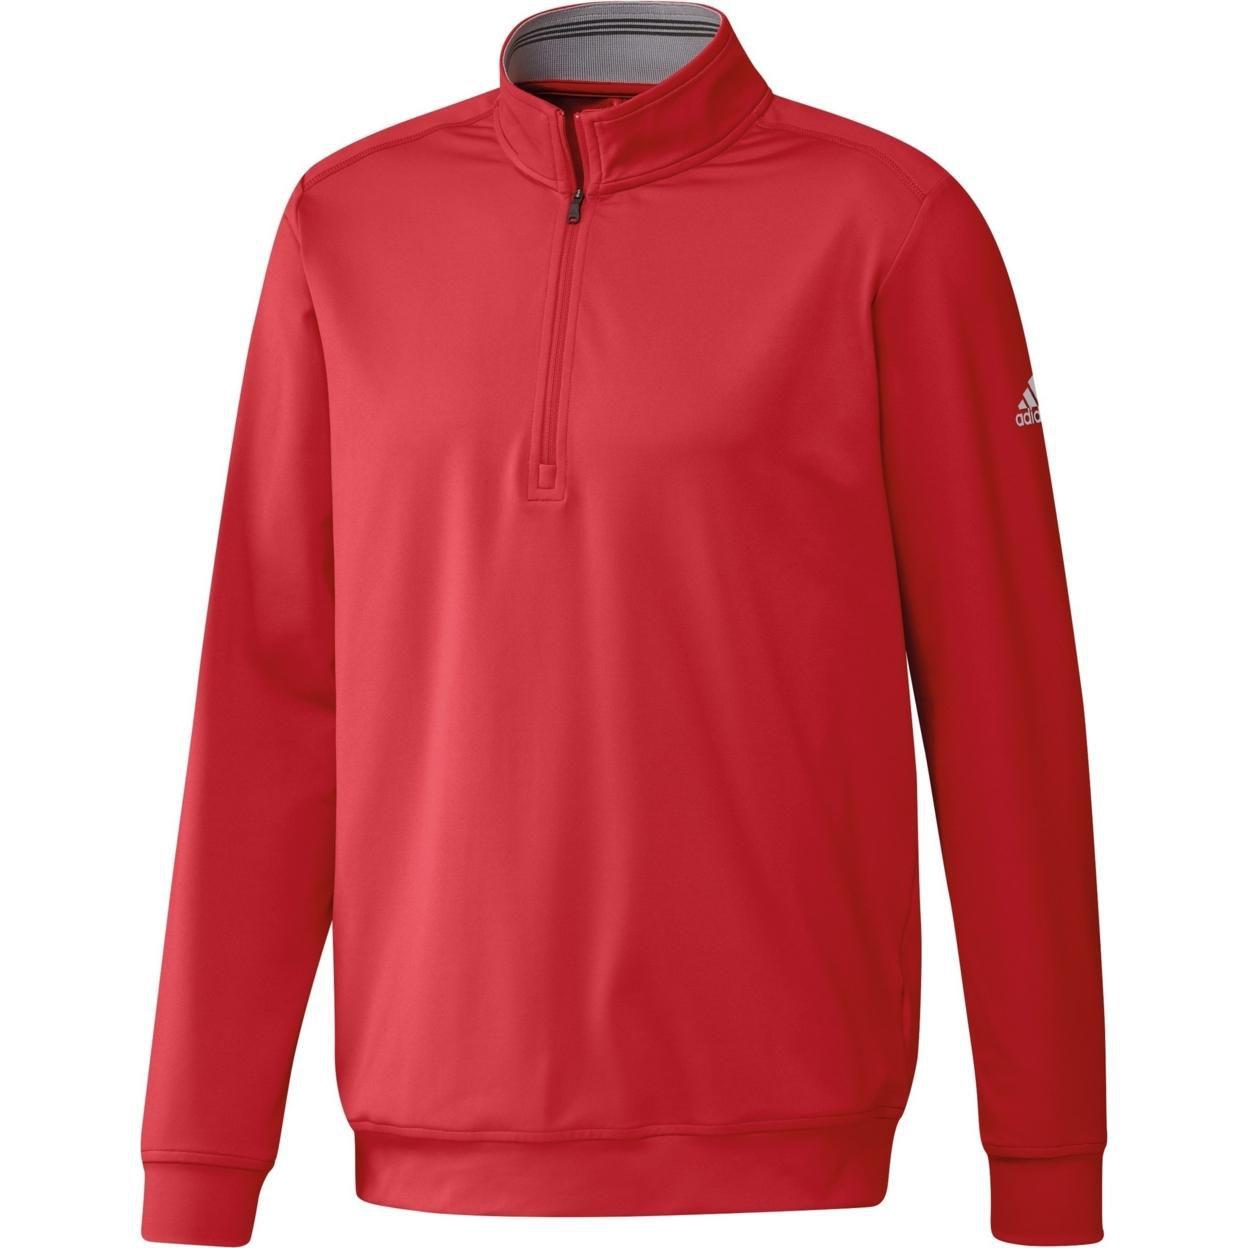 Adidas Mens Classic Club Zip Sweater Size S